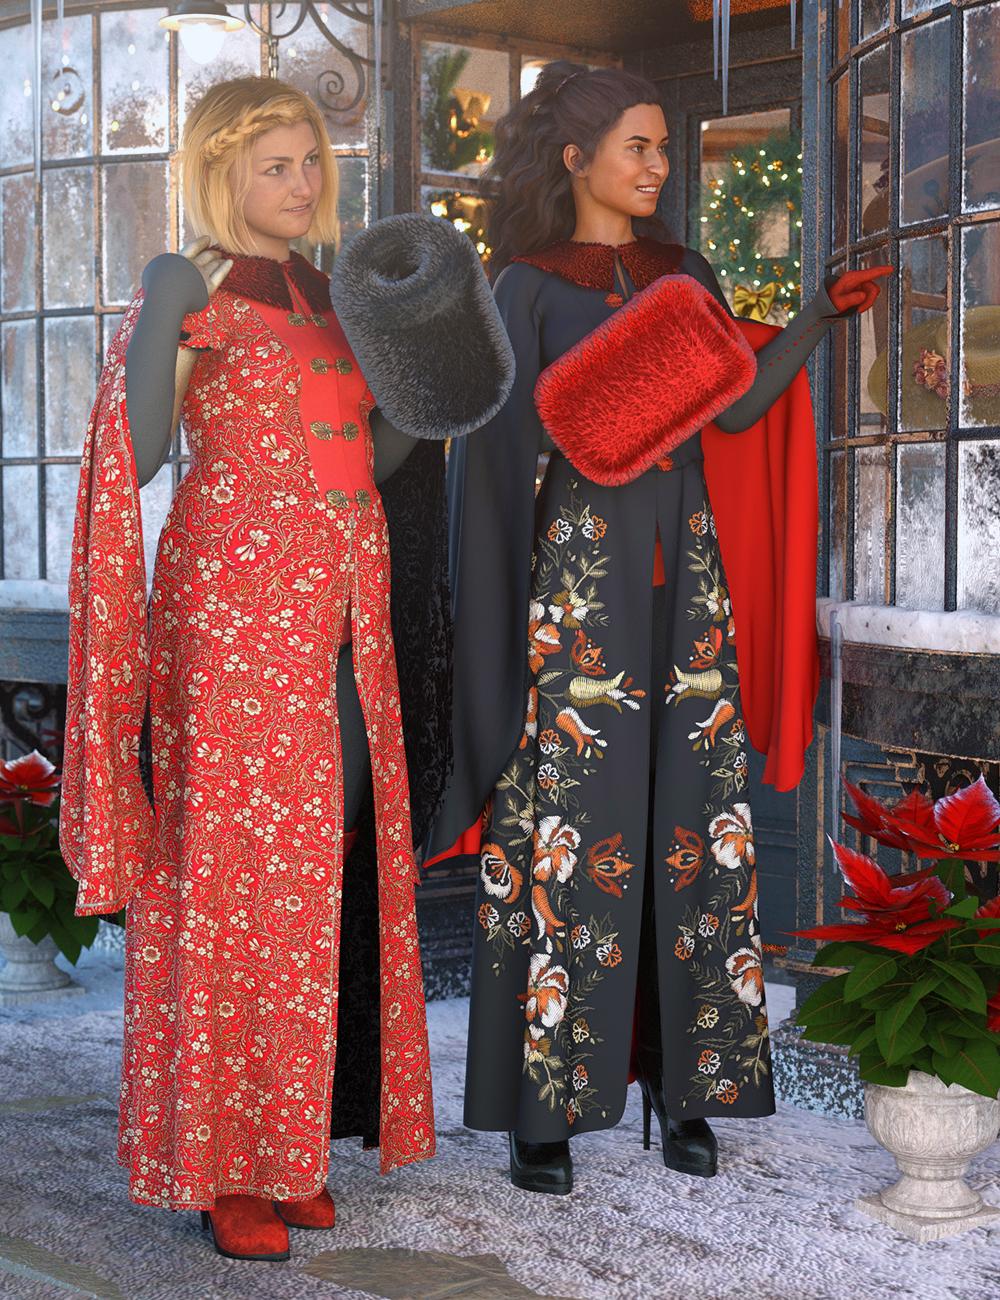 dForce Winter Splendor Outfit Textures by: Moonscape GraphicsSade, 3D Models by Daz 3D